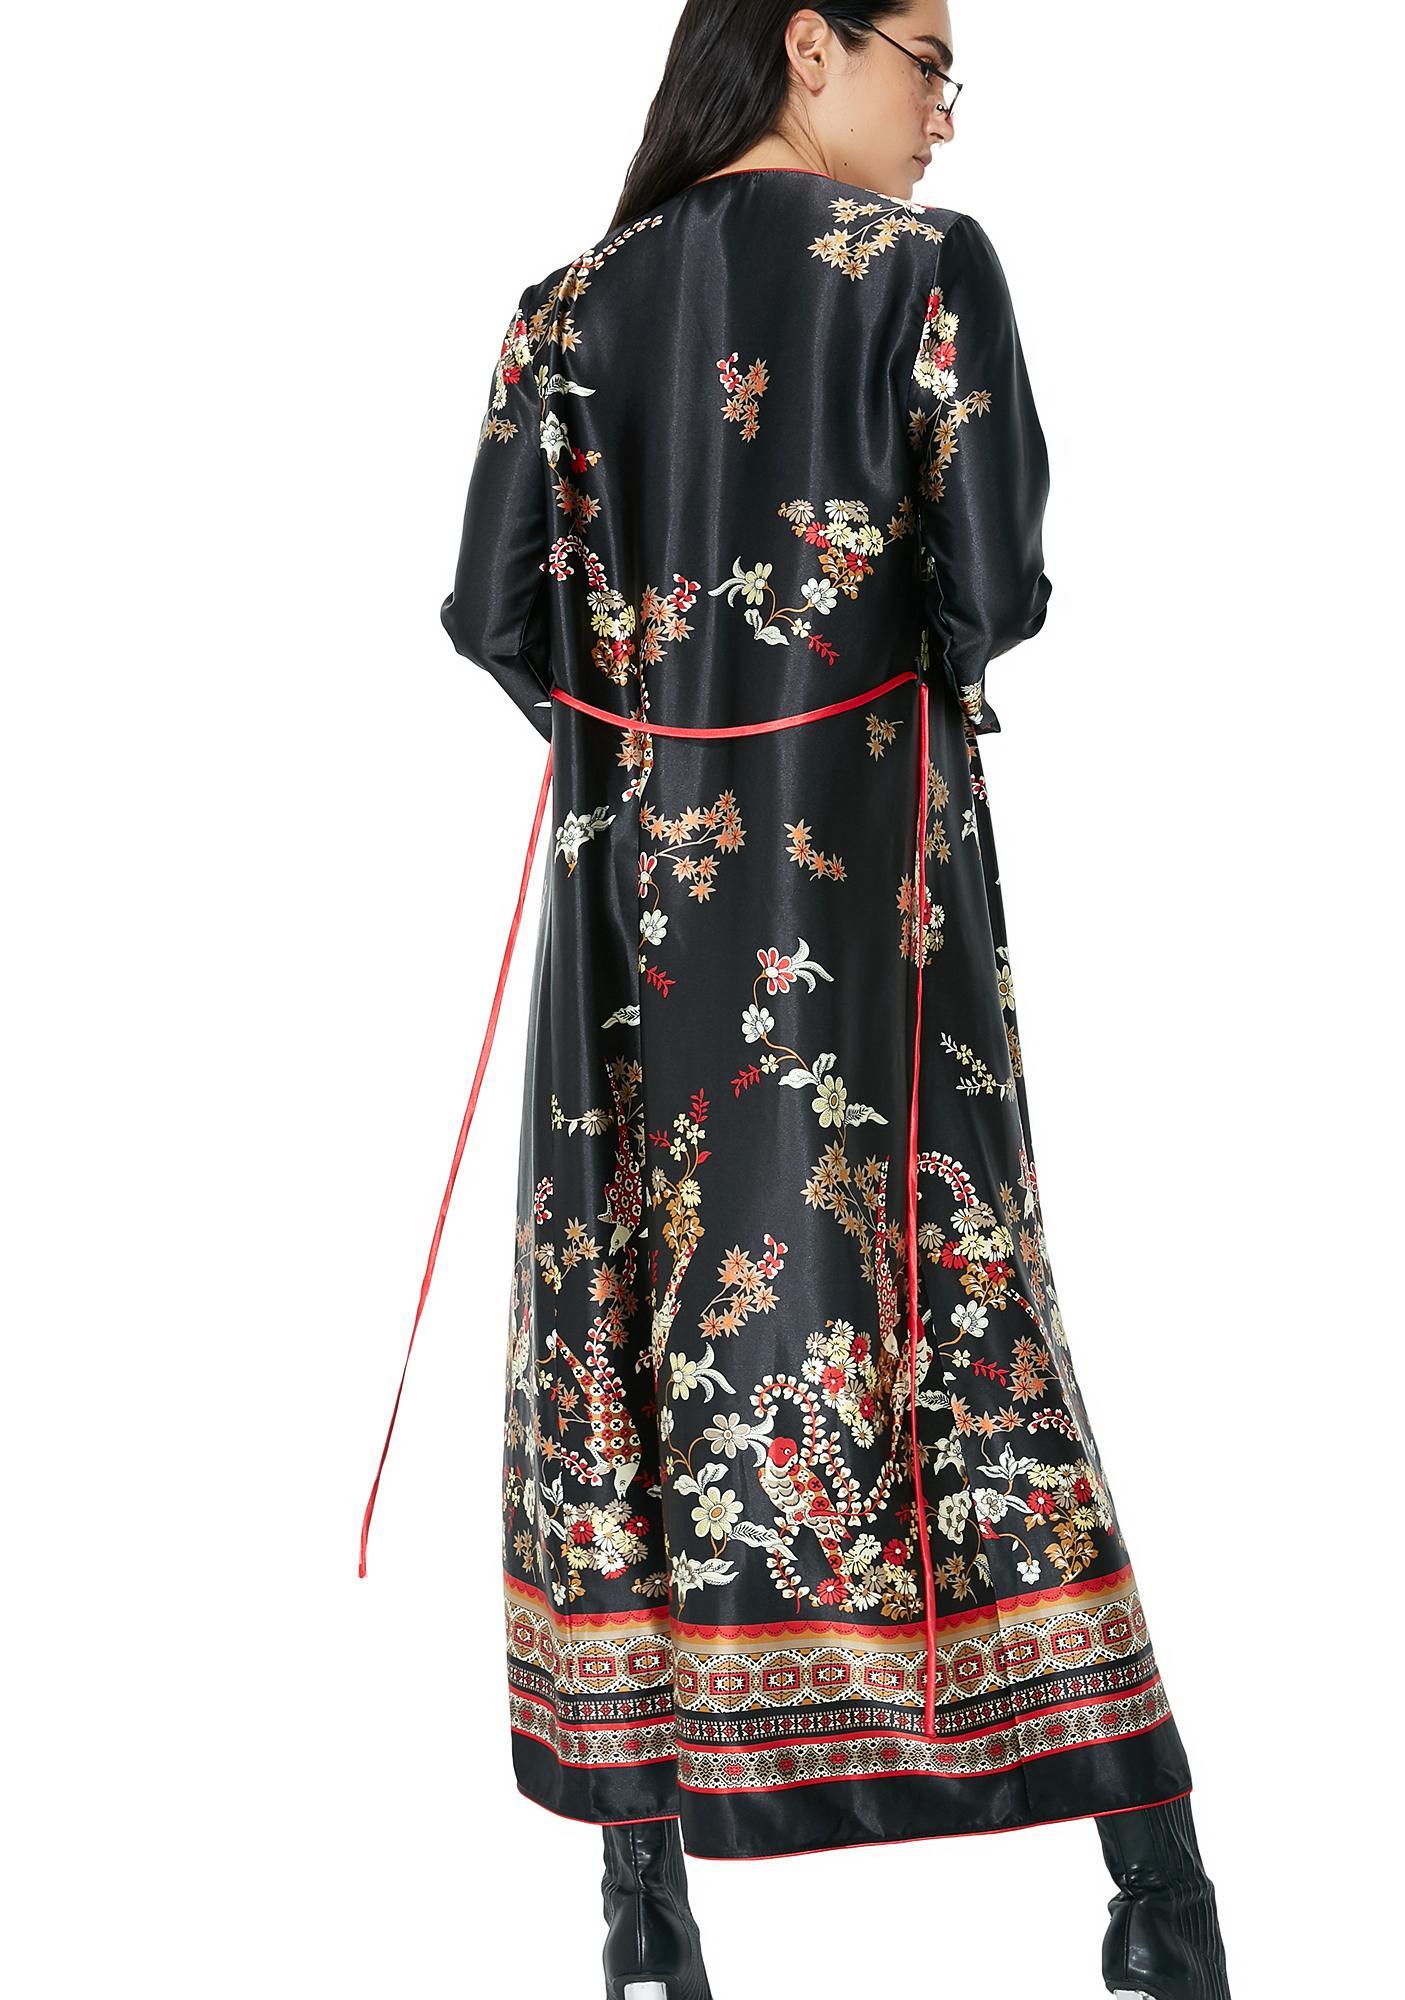 Harmony Kimono